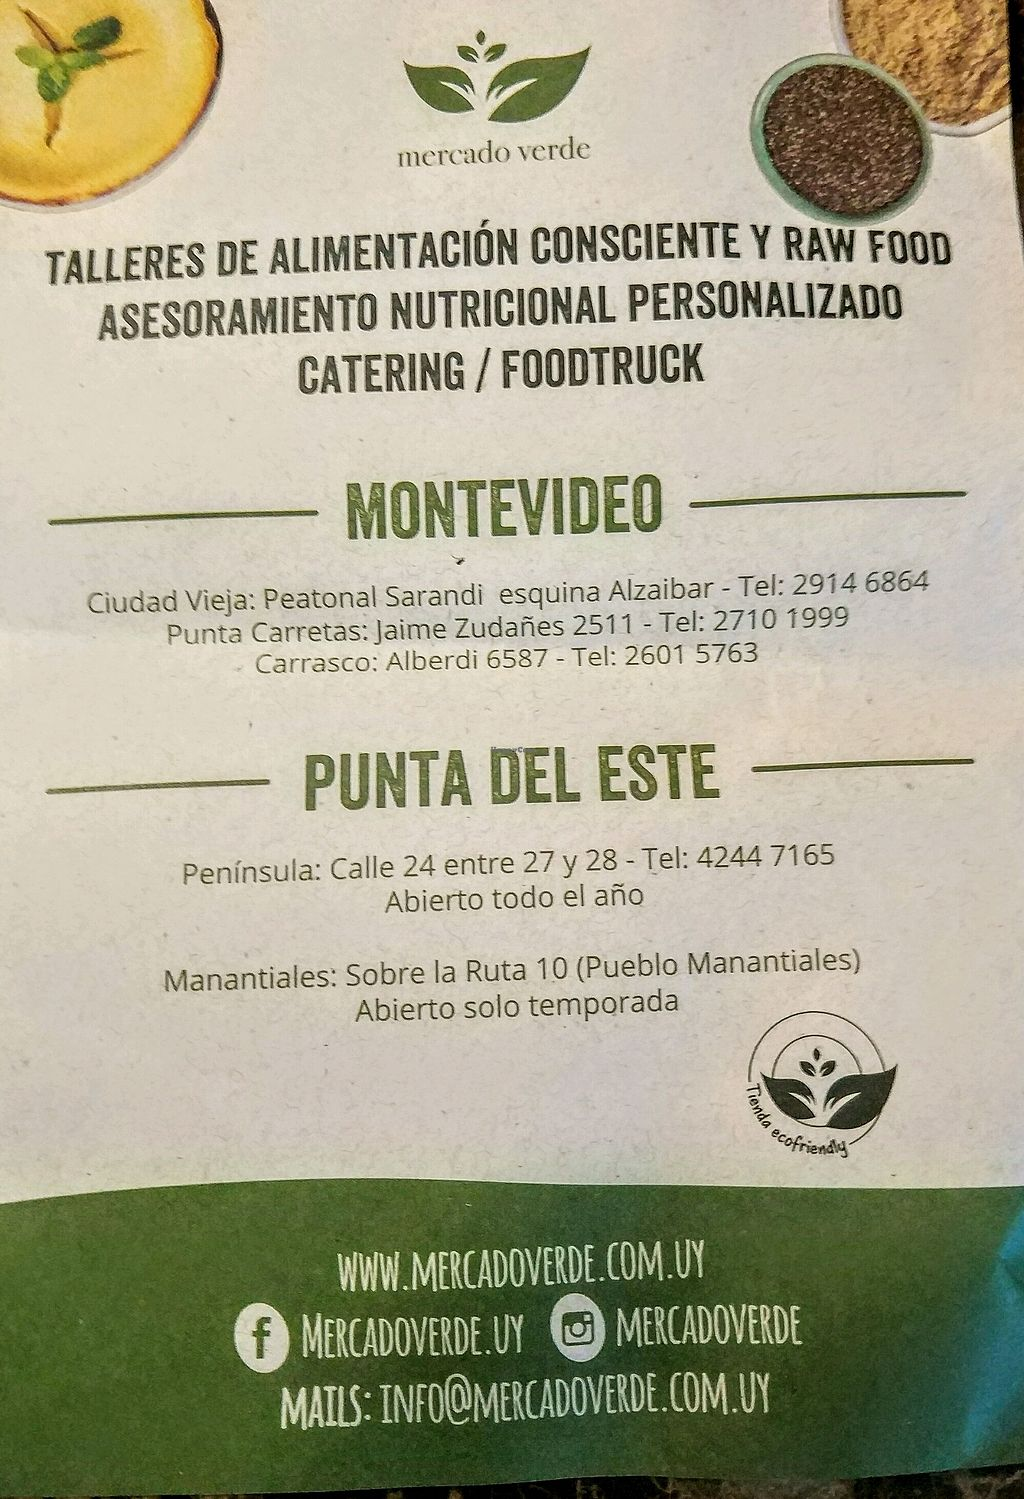 "Photo of Mercado Verde - Jaime Zudanes  by <a href=""/members/profile/Aquilesgc"">Aquilesgc</a> <br/>Folleto 2, direcciones <br/> October 4, 2017  - <a href='/contact/abuse/image/52061/311836'>Report</a>"